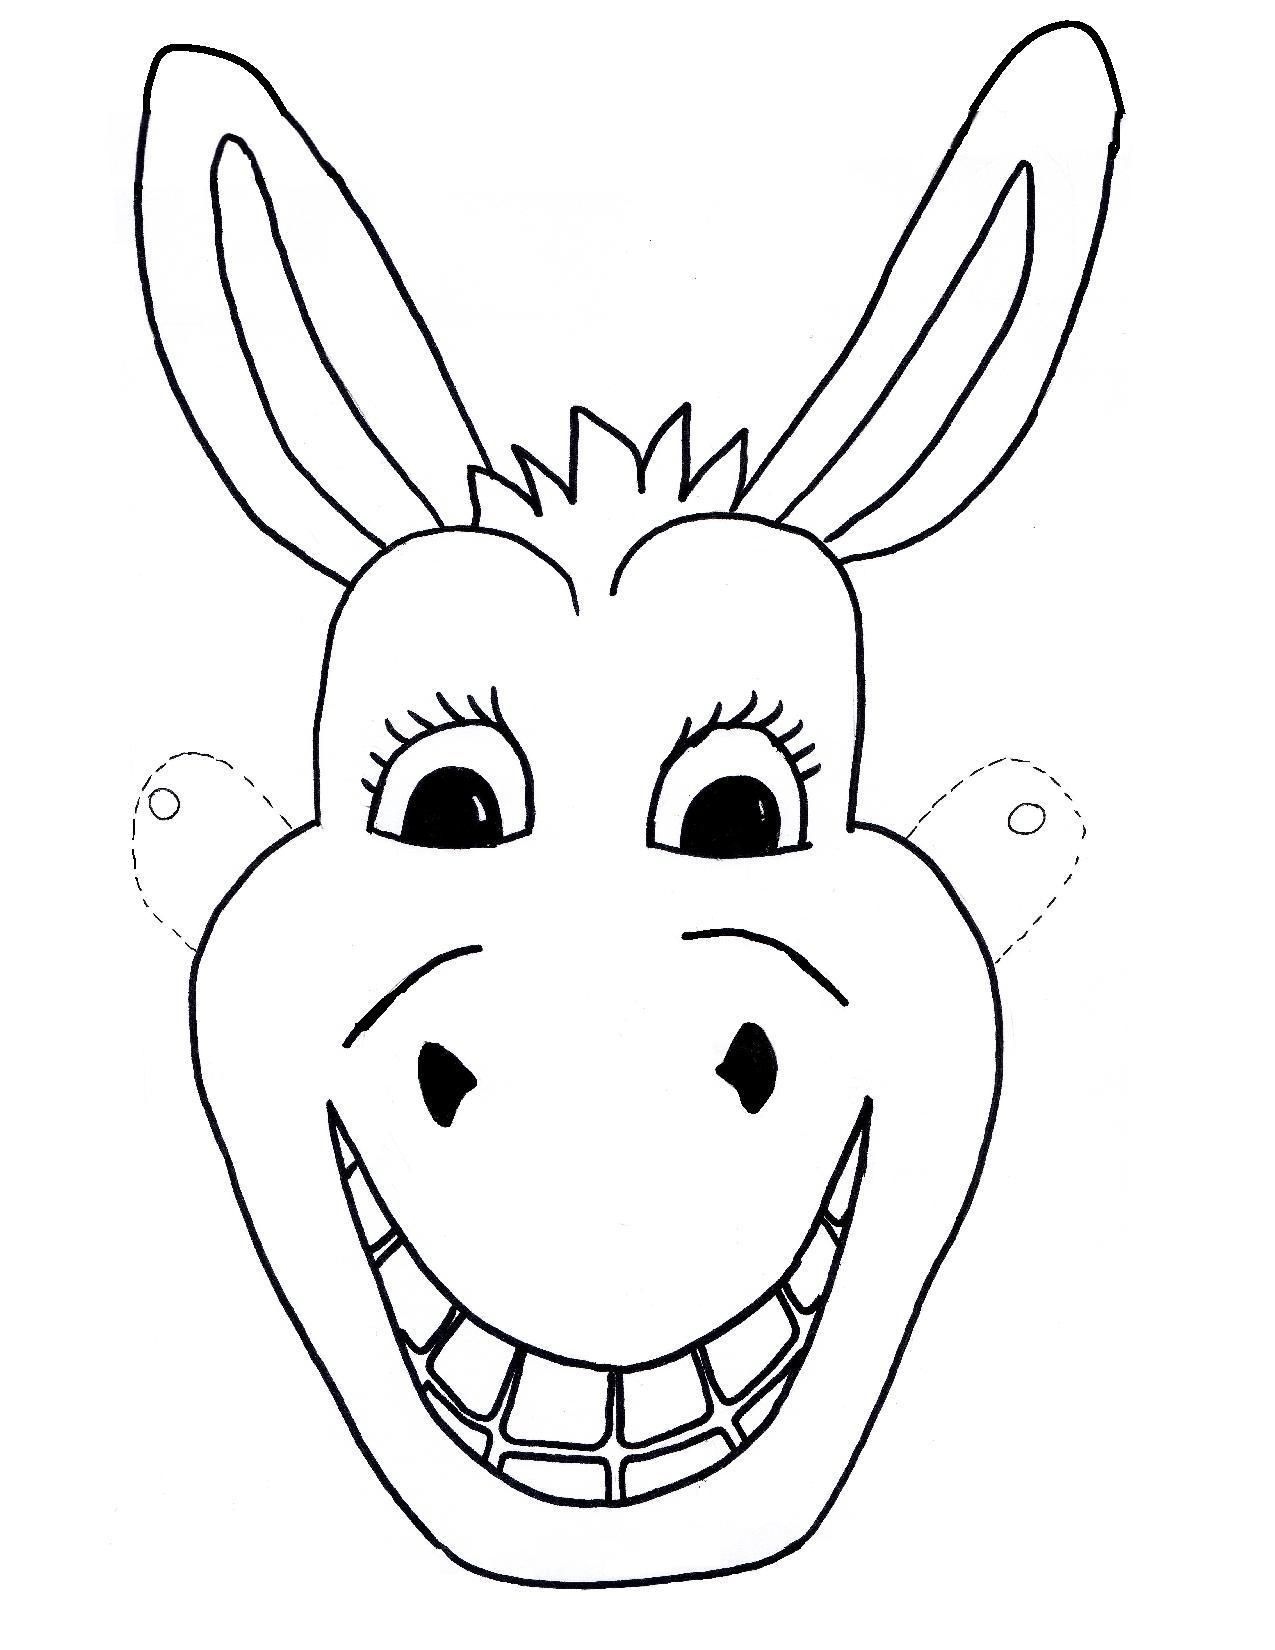 Template-Free-Kids-Mask-Donkey-Craft-Children- | Sunday School Ideas - Animal Face Masks Printable Free